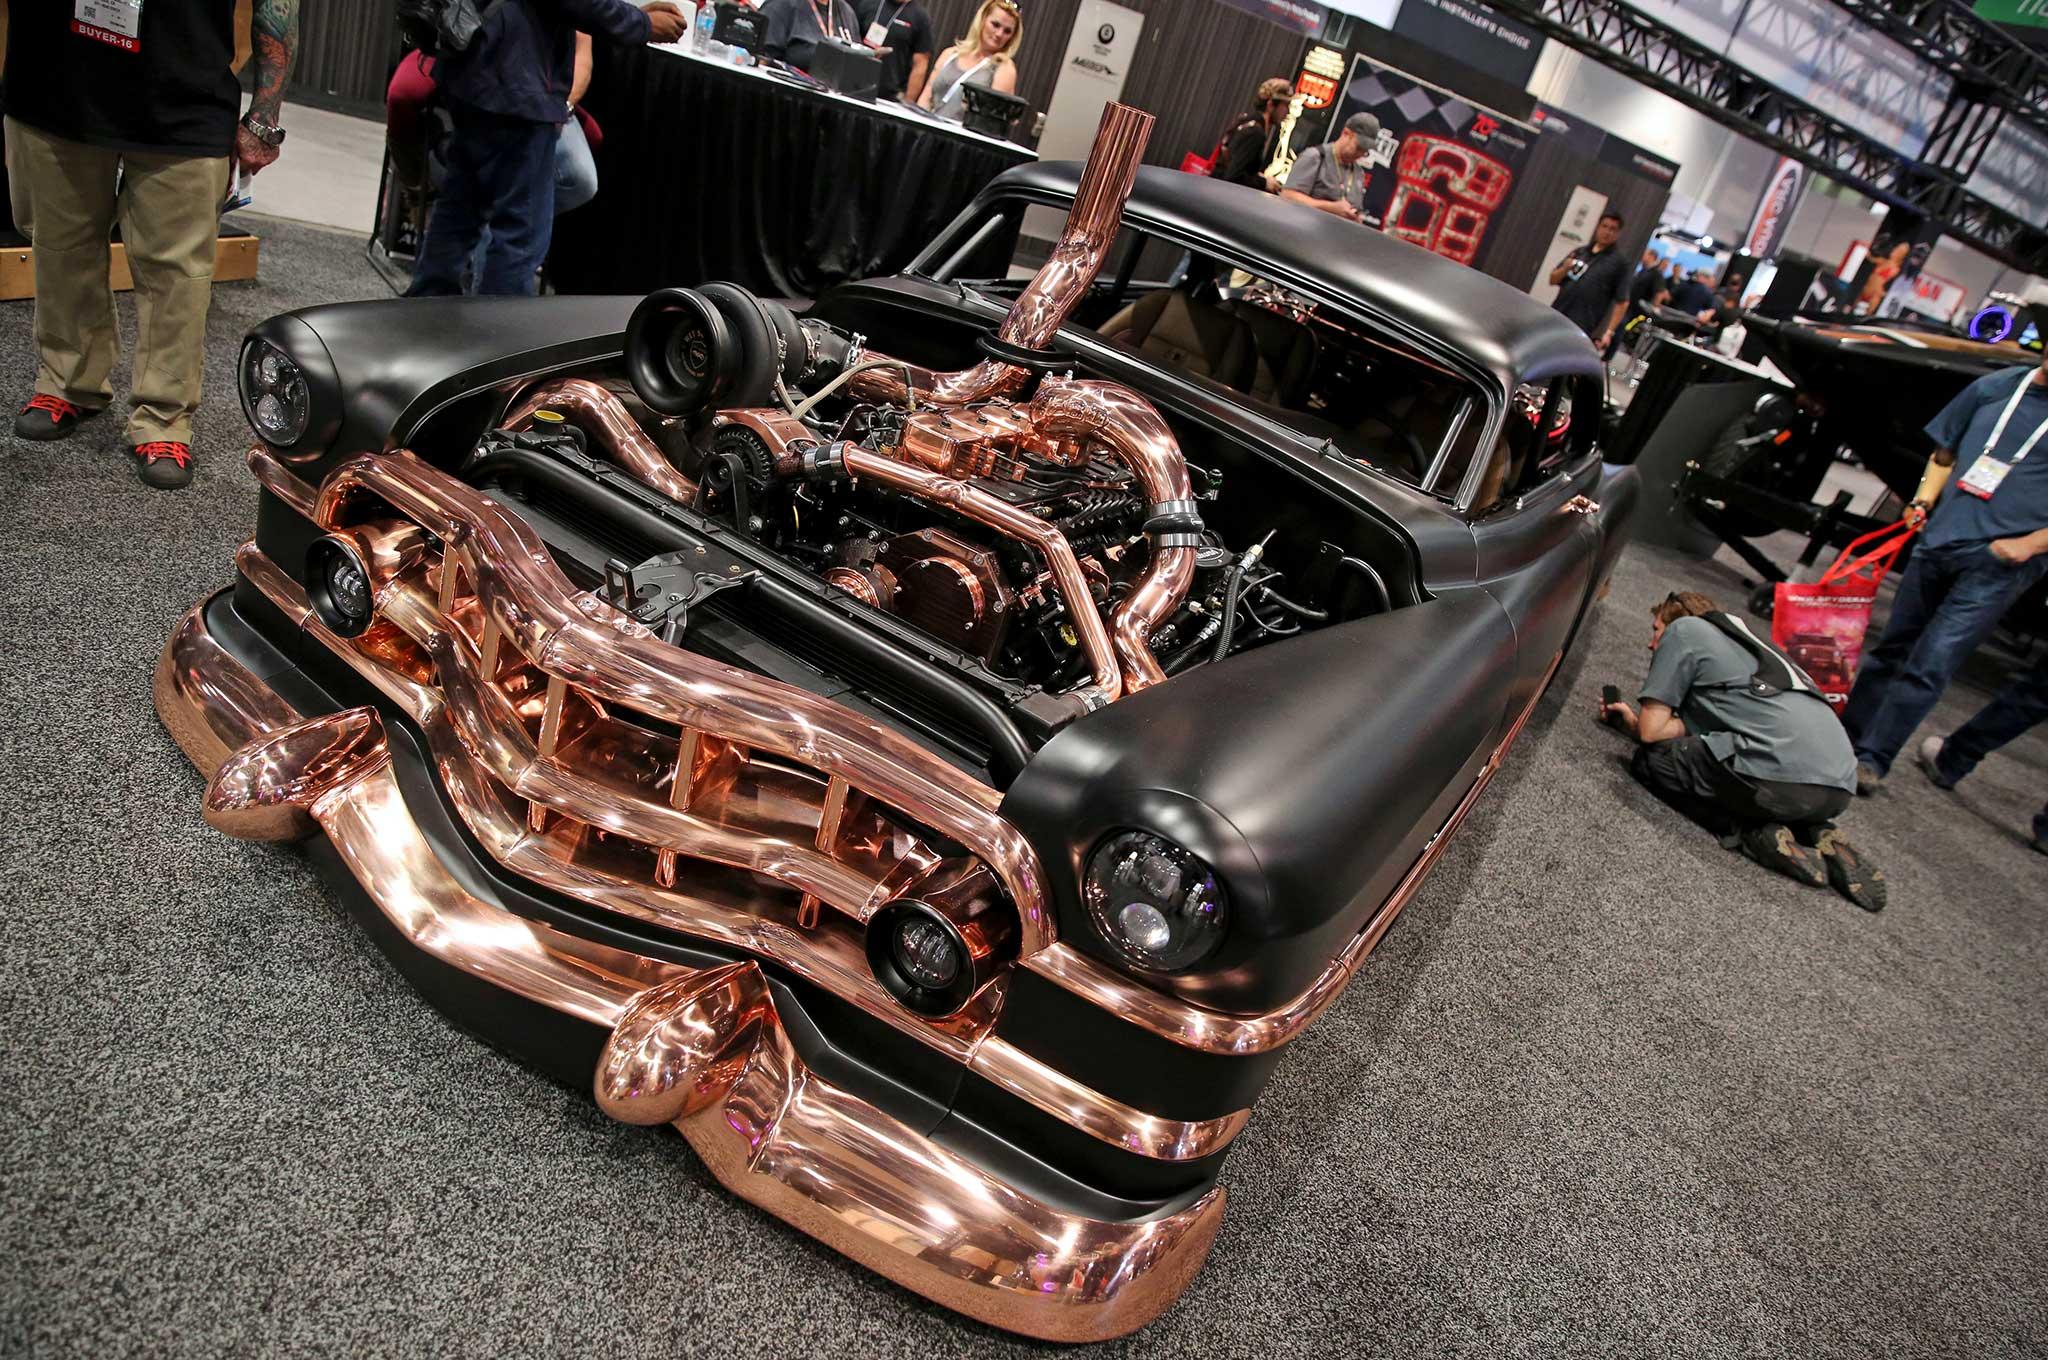 Hotrod Cadillac